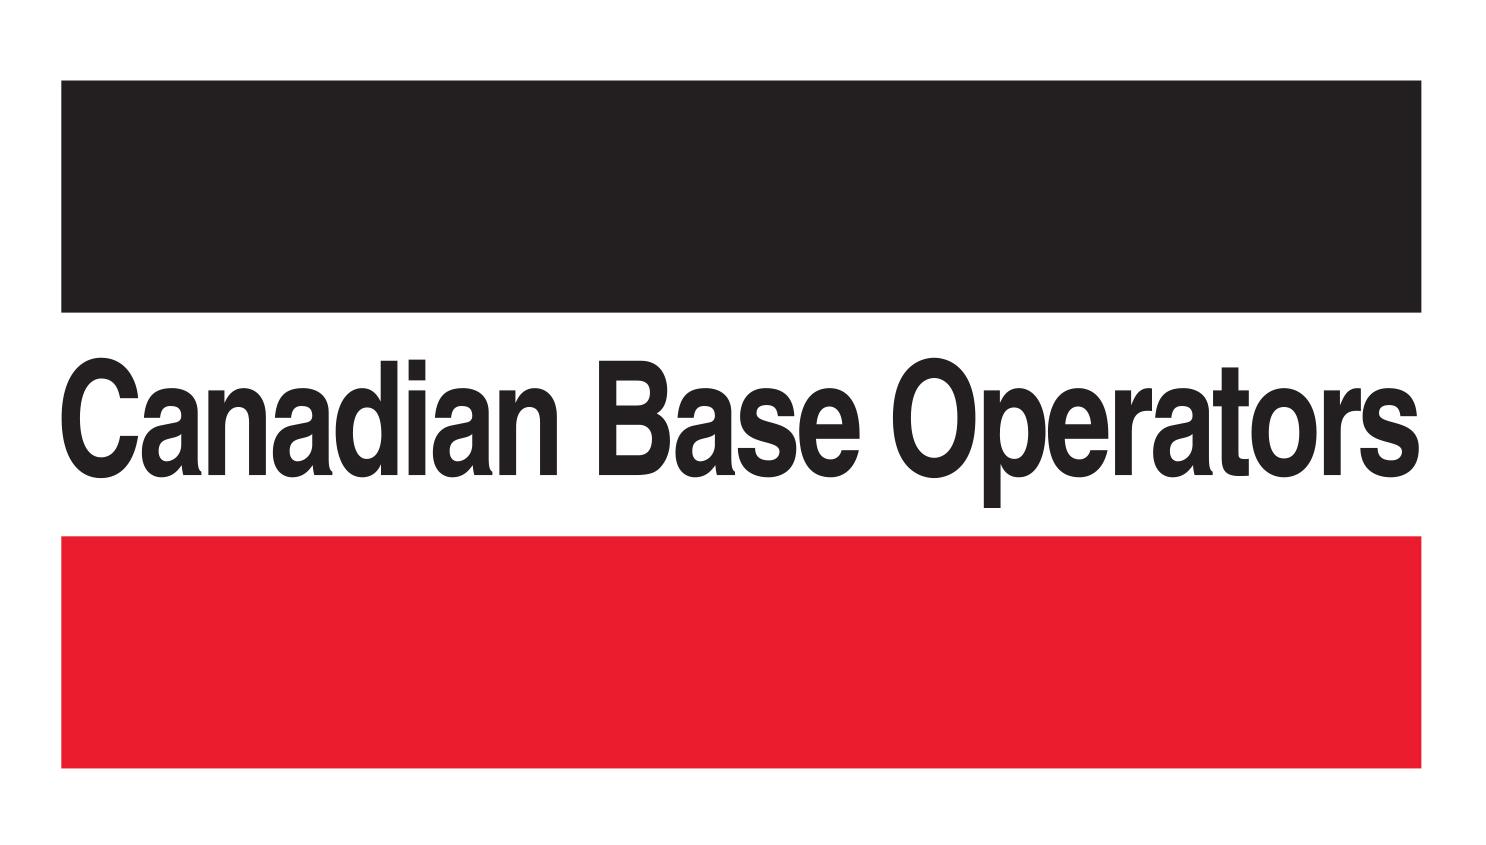 Canadian Base Operators